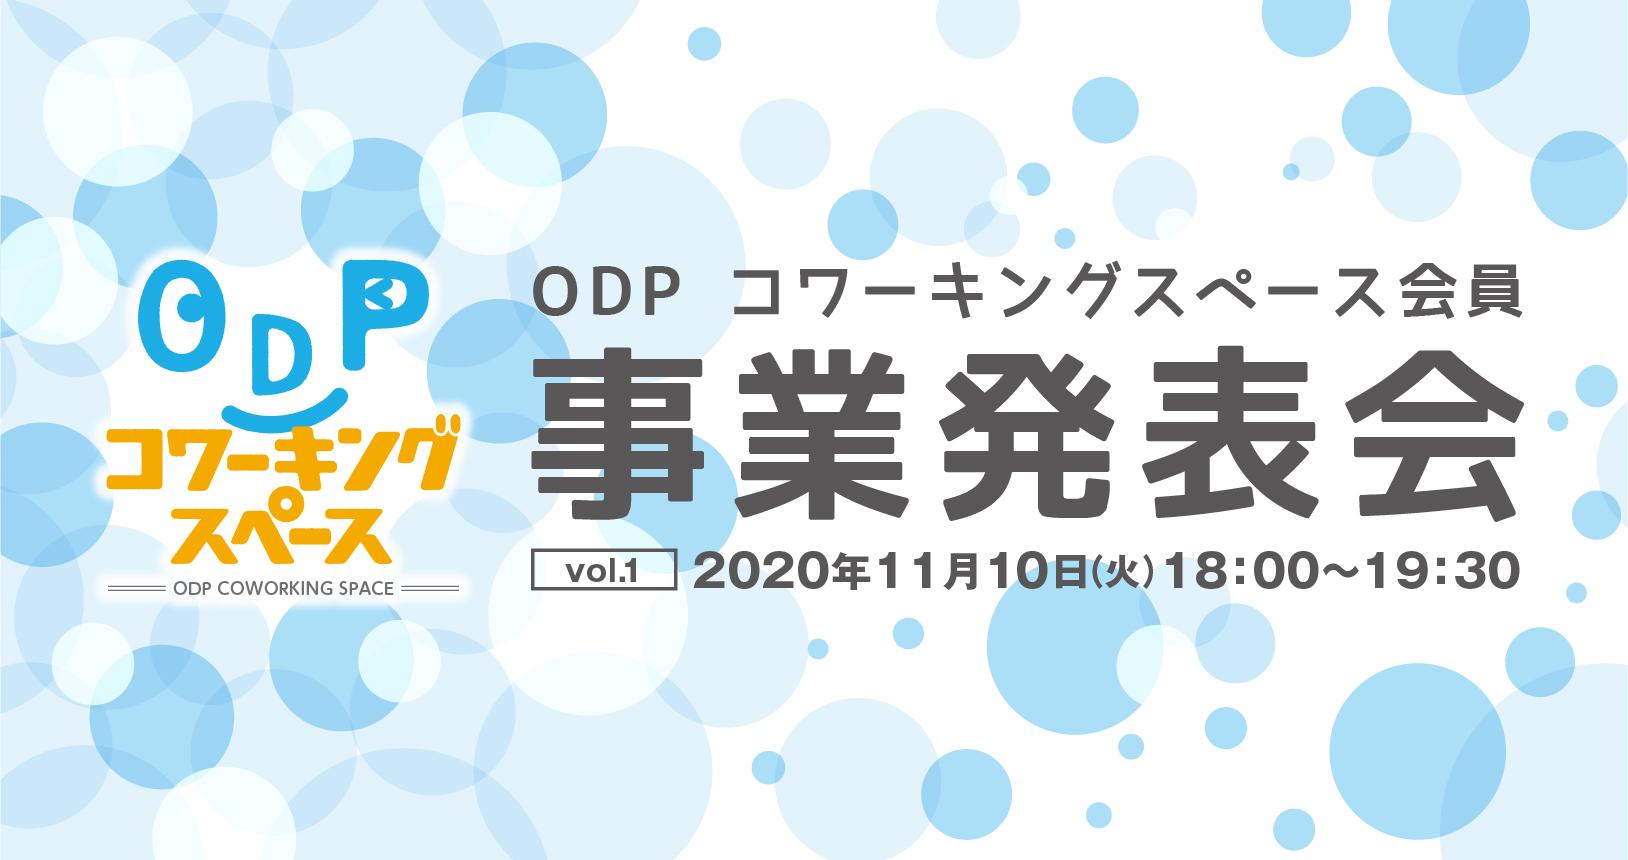 ODPコワーキングスペース会員 事業発表会